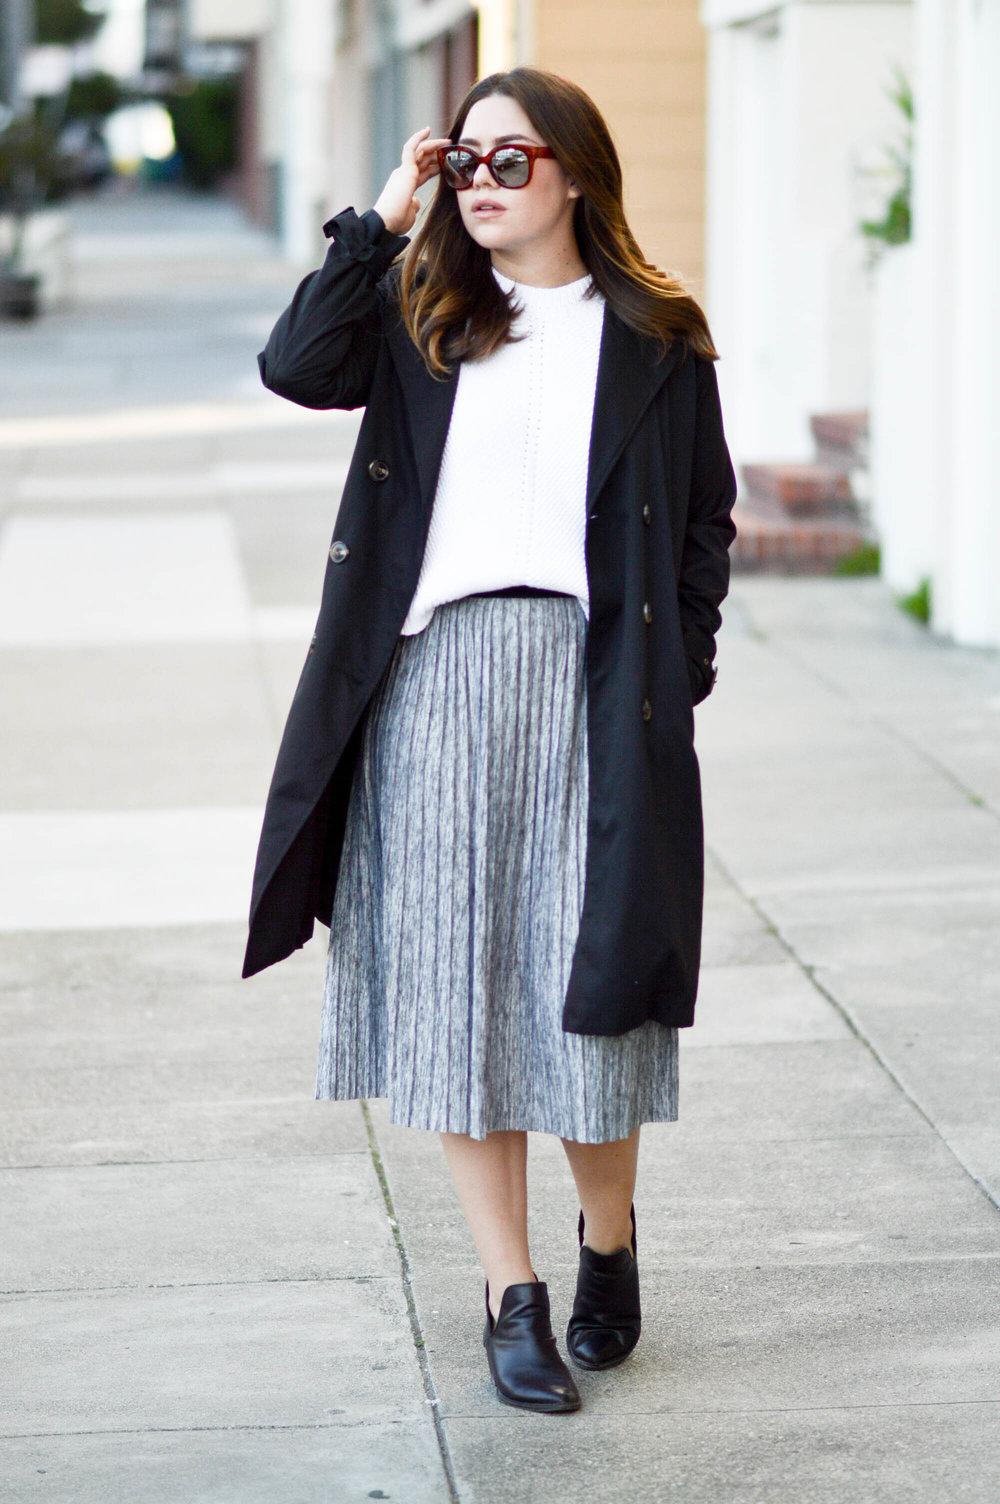 Pleated Skirt & Trench Coat via. www.birdieshoots.com